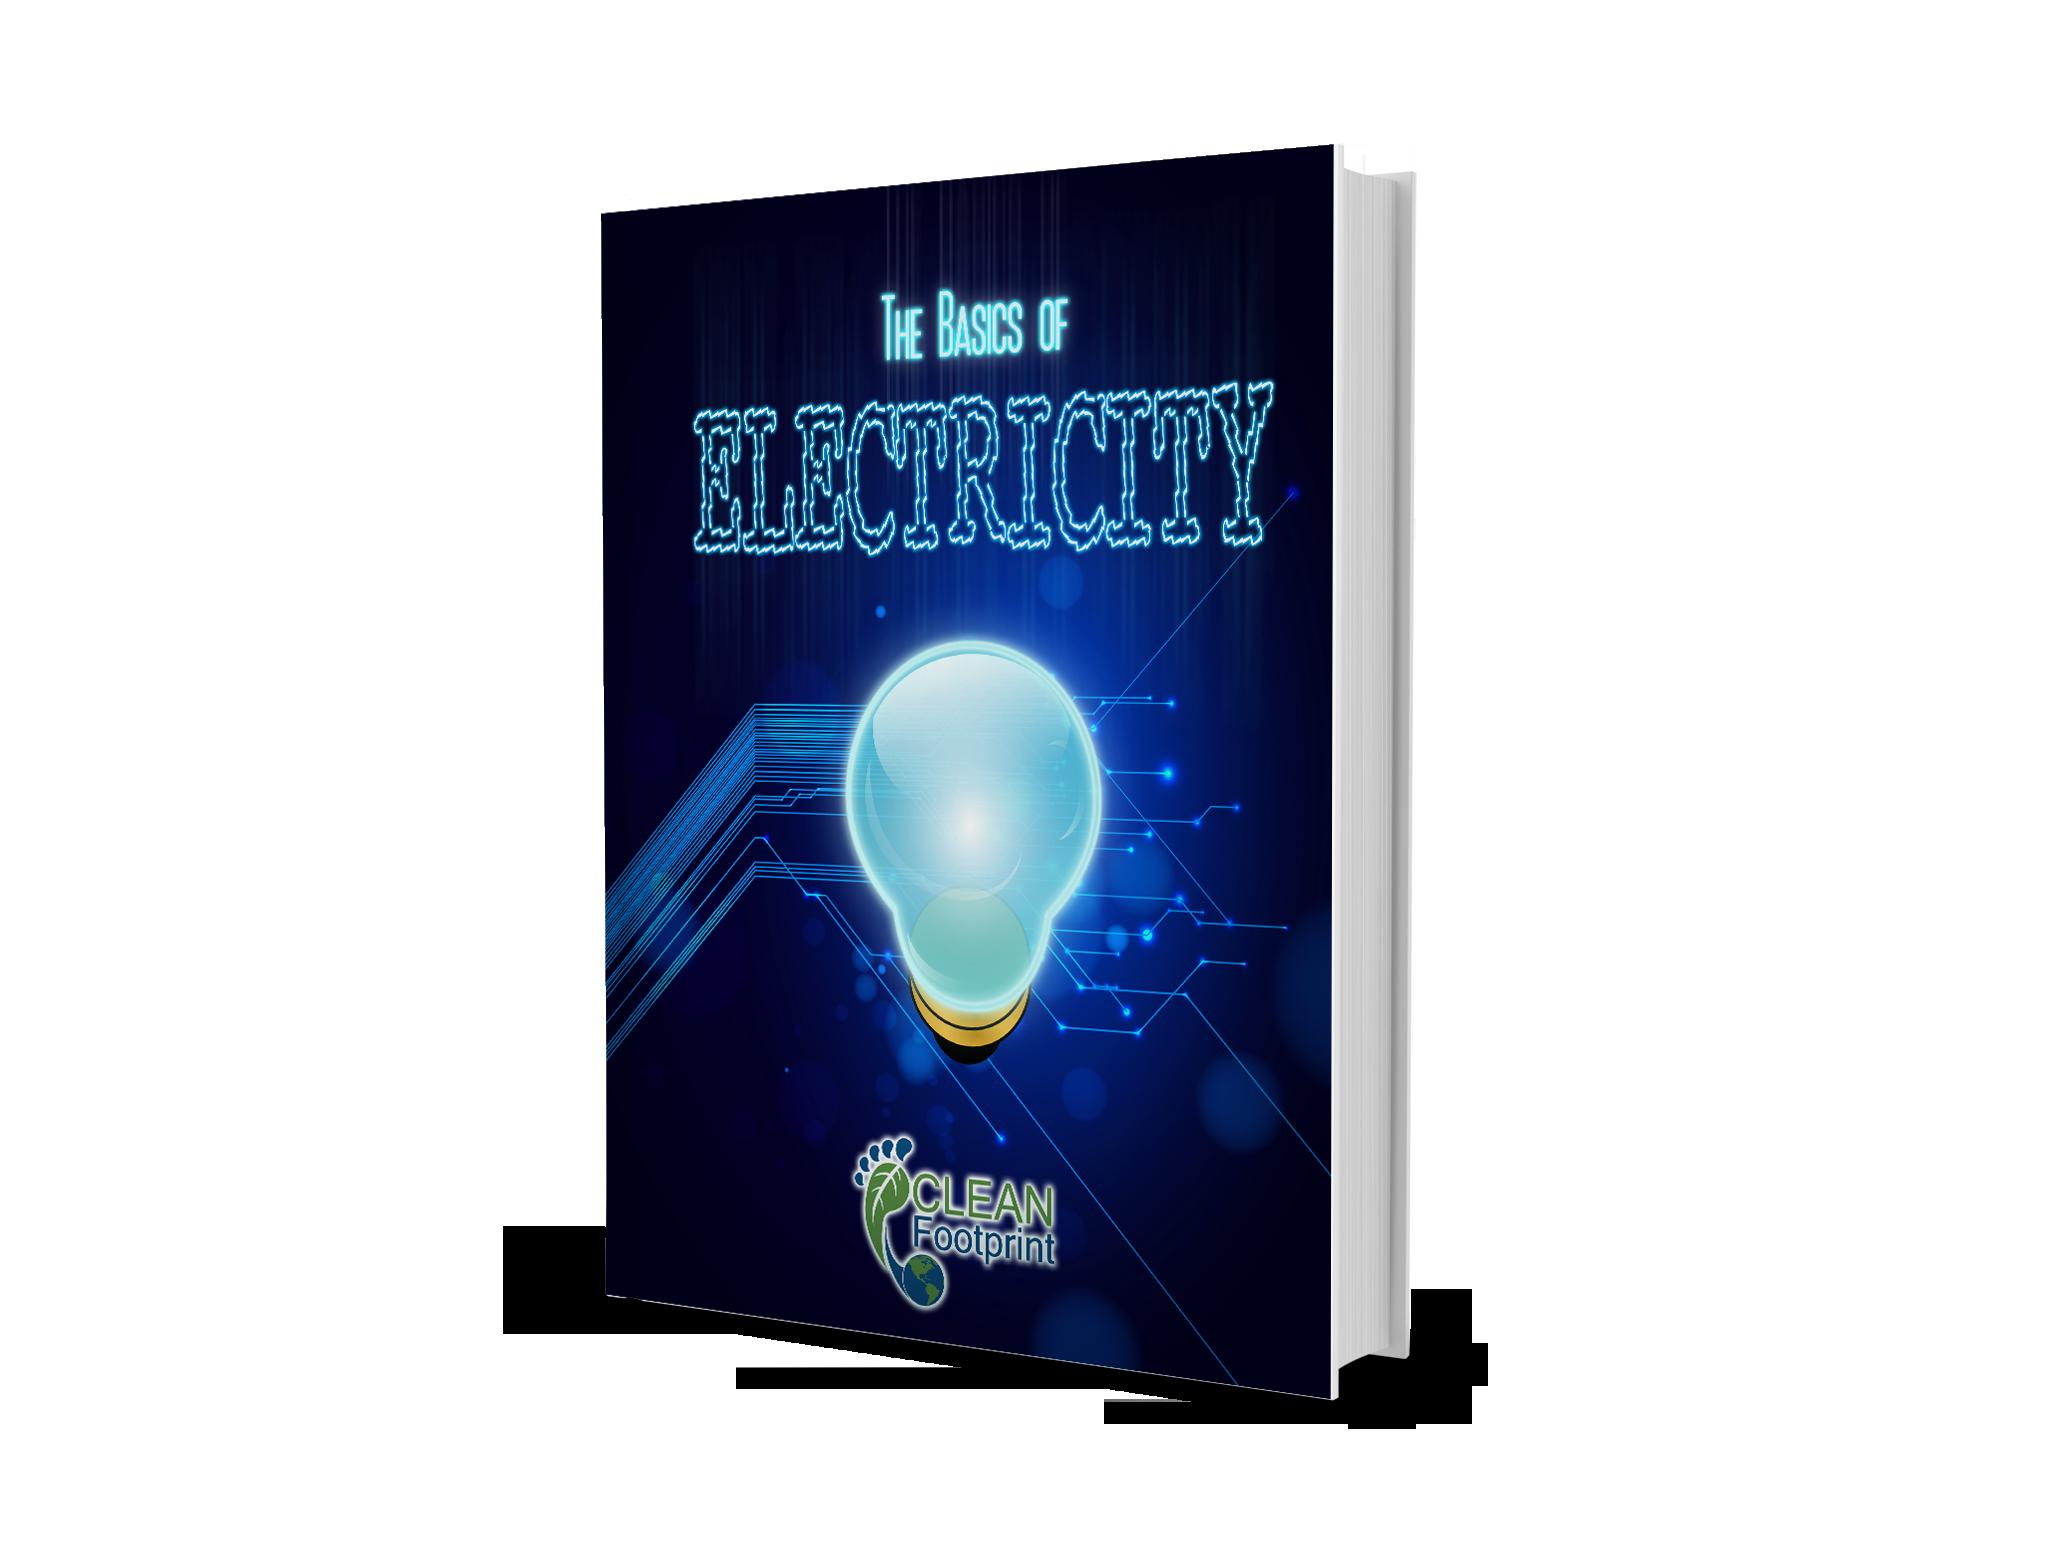 basics-of-electricity